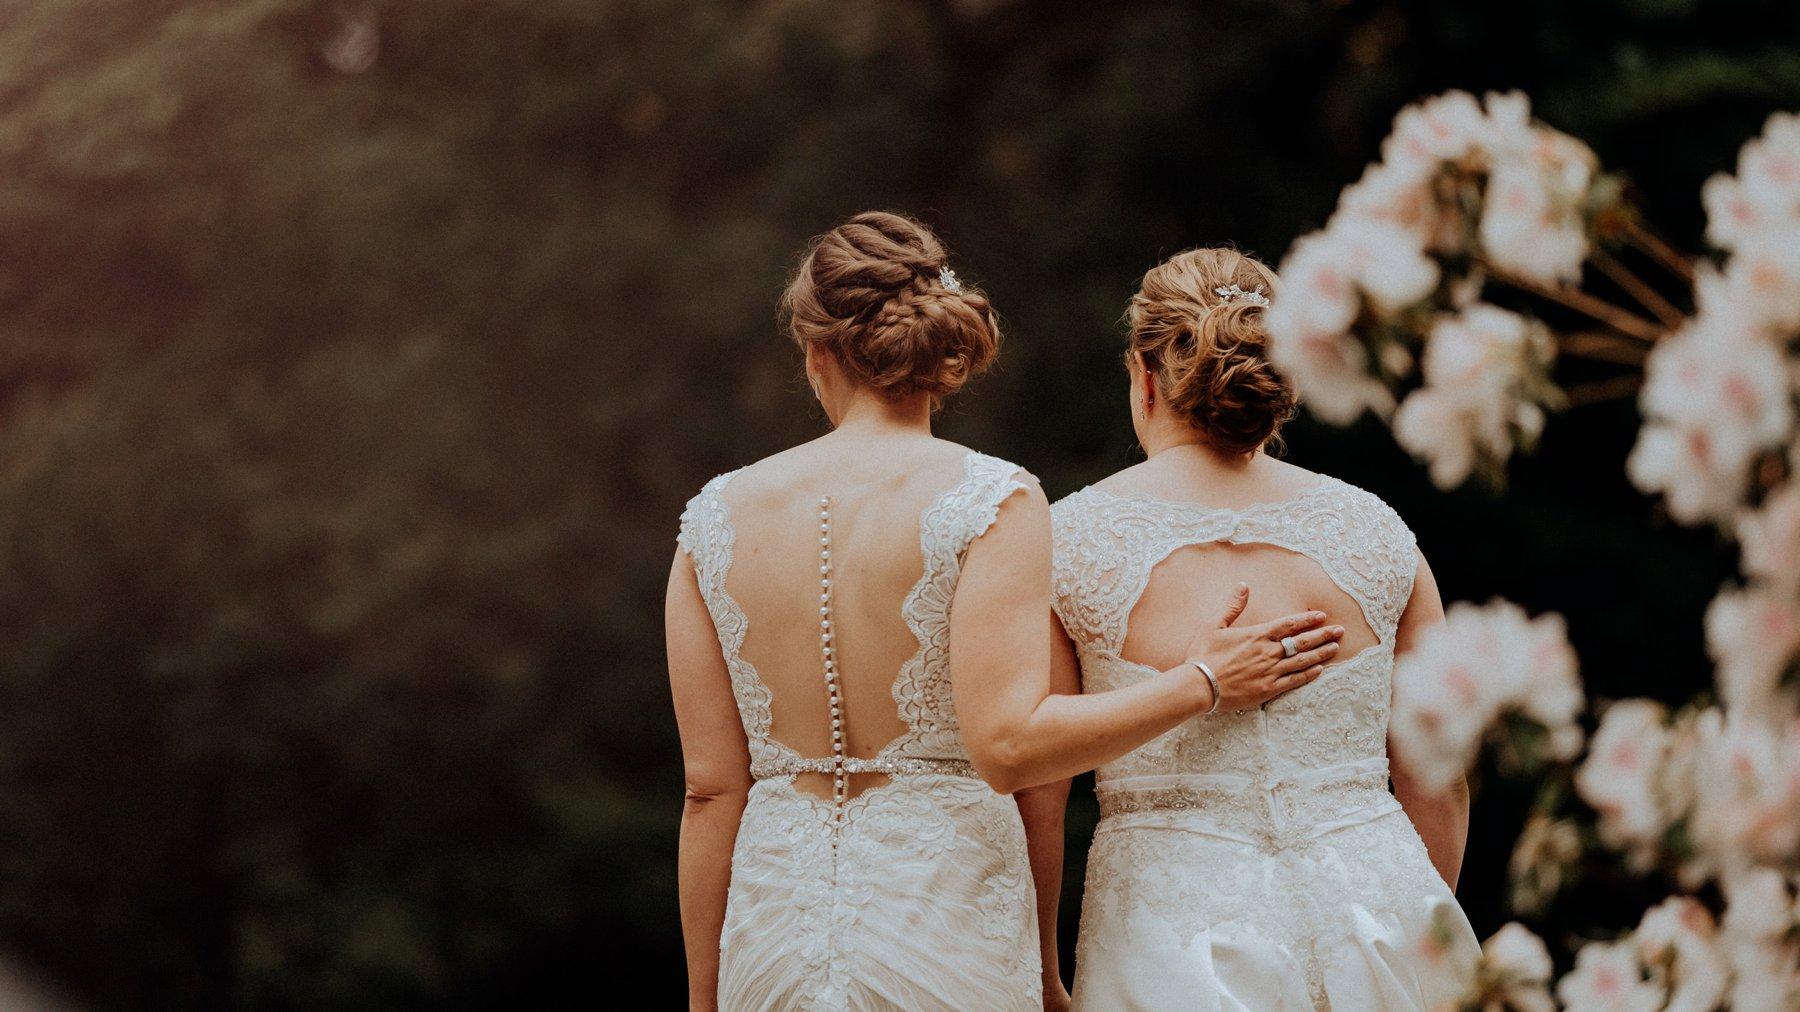 270-271-winterthur-wedding-2.jpg